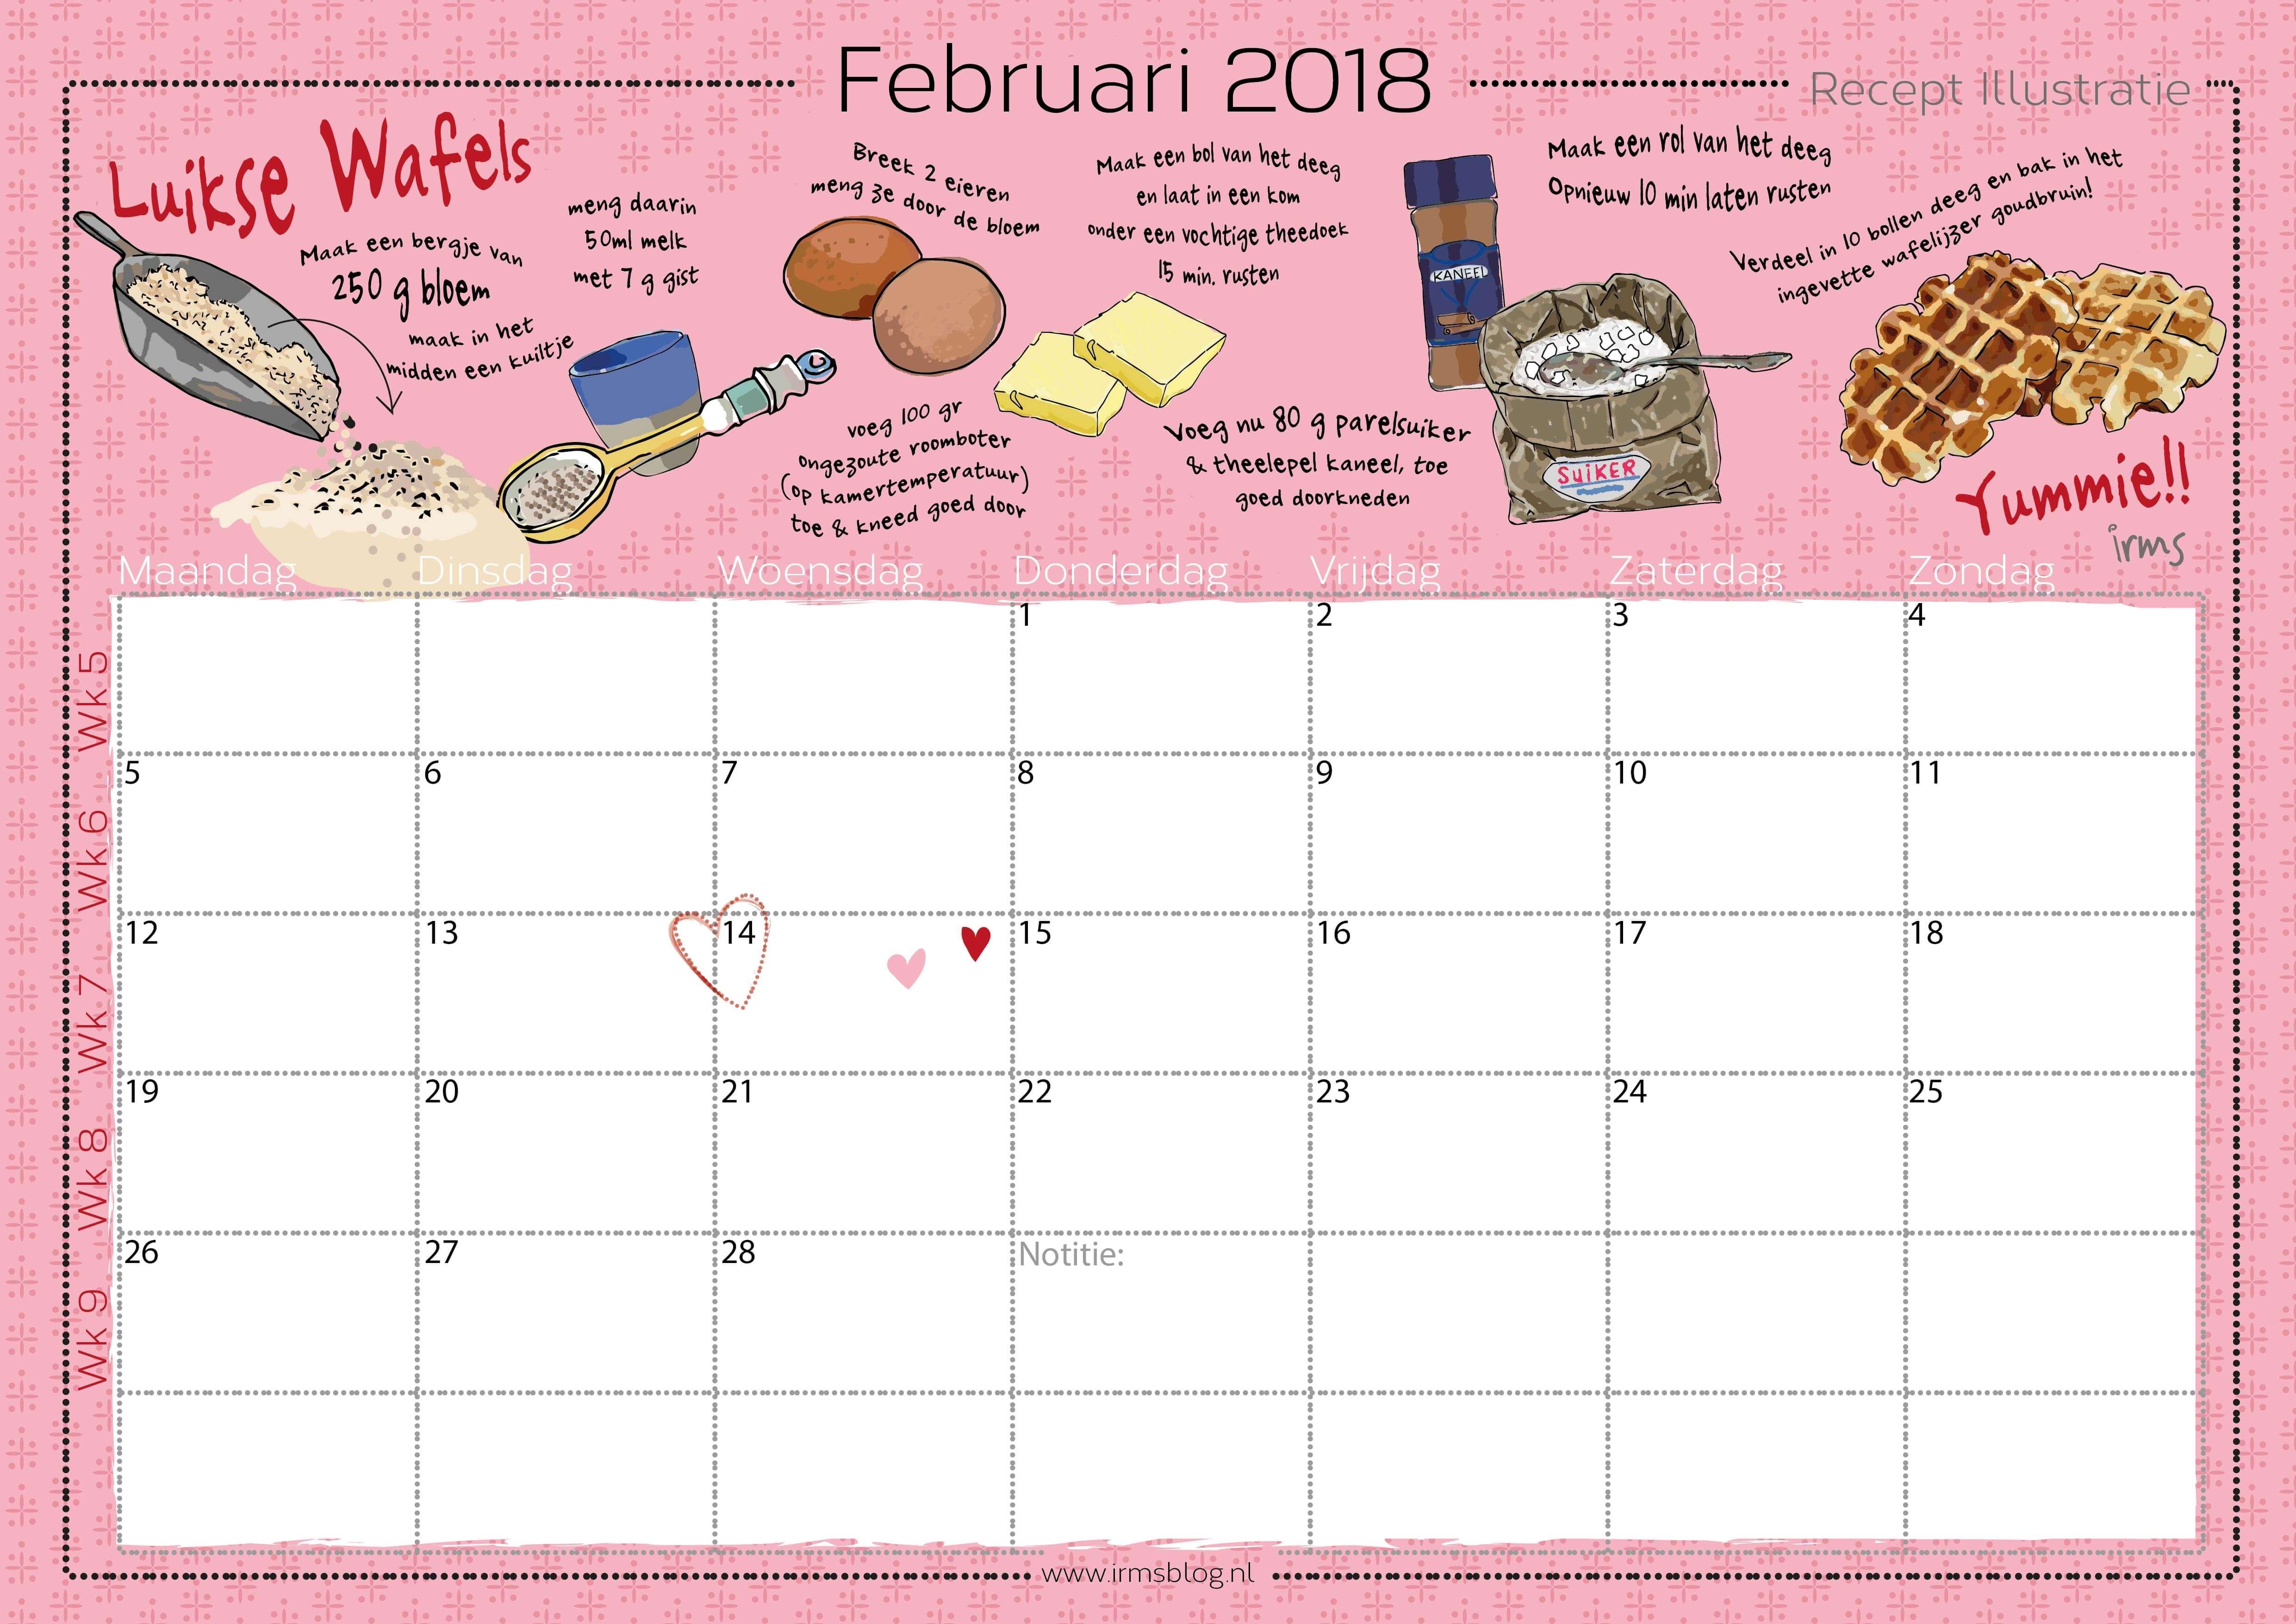 receptenkalender-2018-irmsblog_luikse wafels